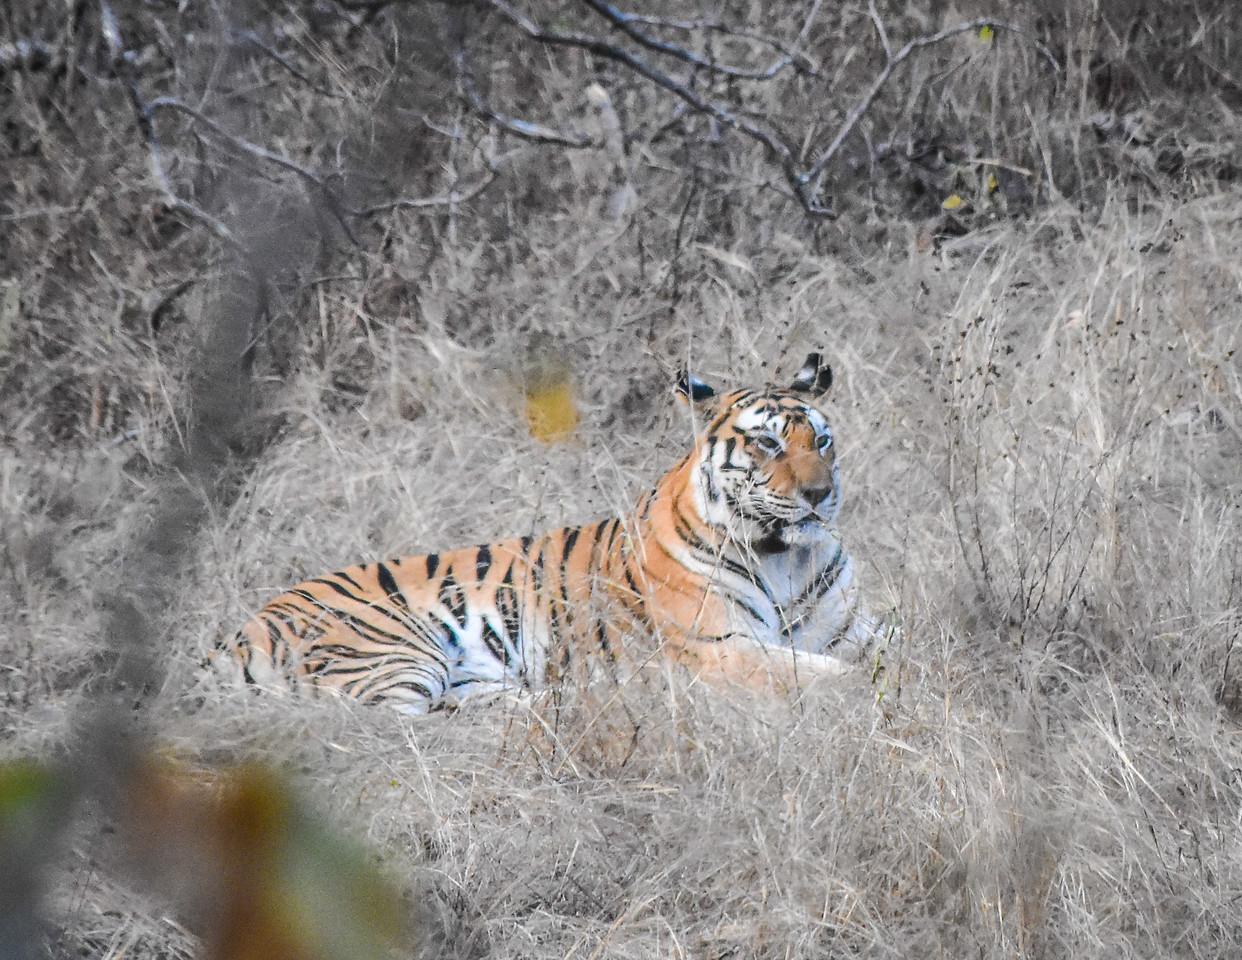 Tiger in Repose, Panna National Park, India